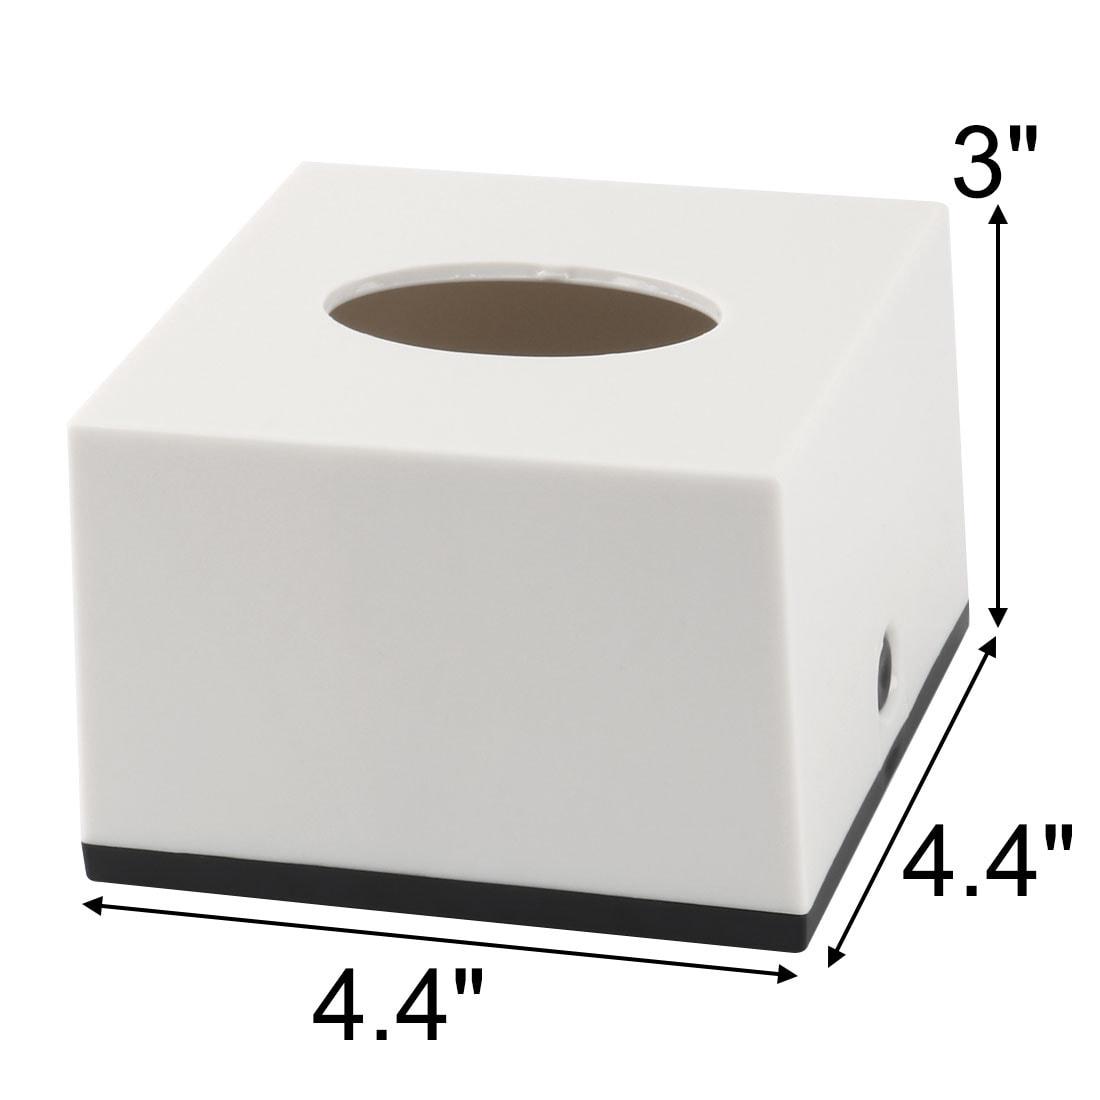 Storage Napkin Tissue Holder Napkins Container Box Home Cute Ornaments Xmas N3